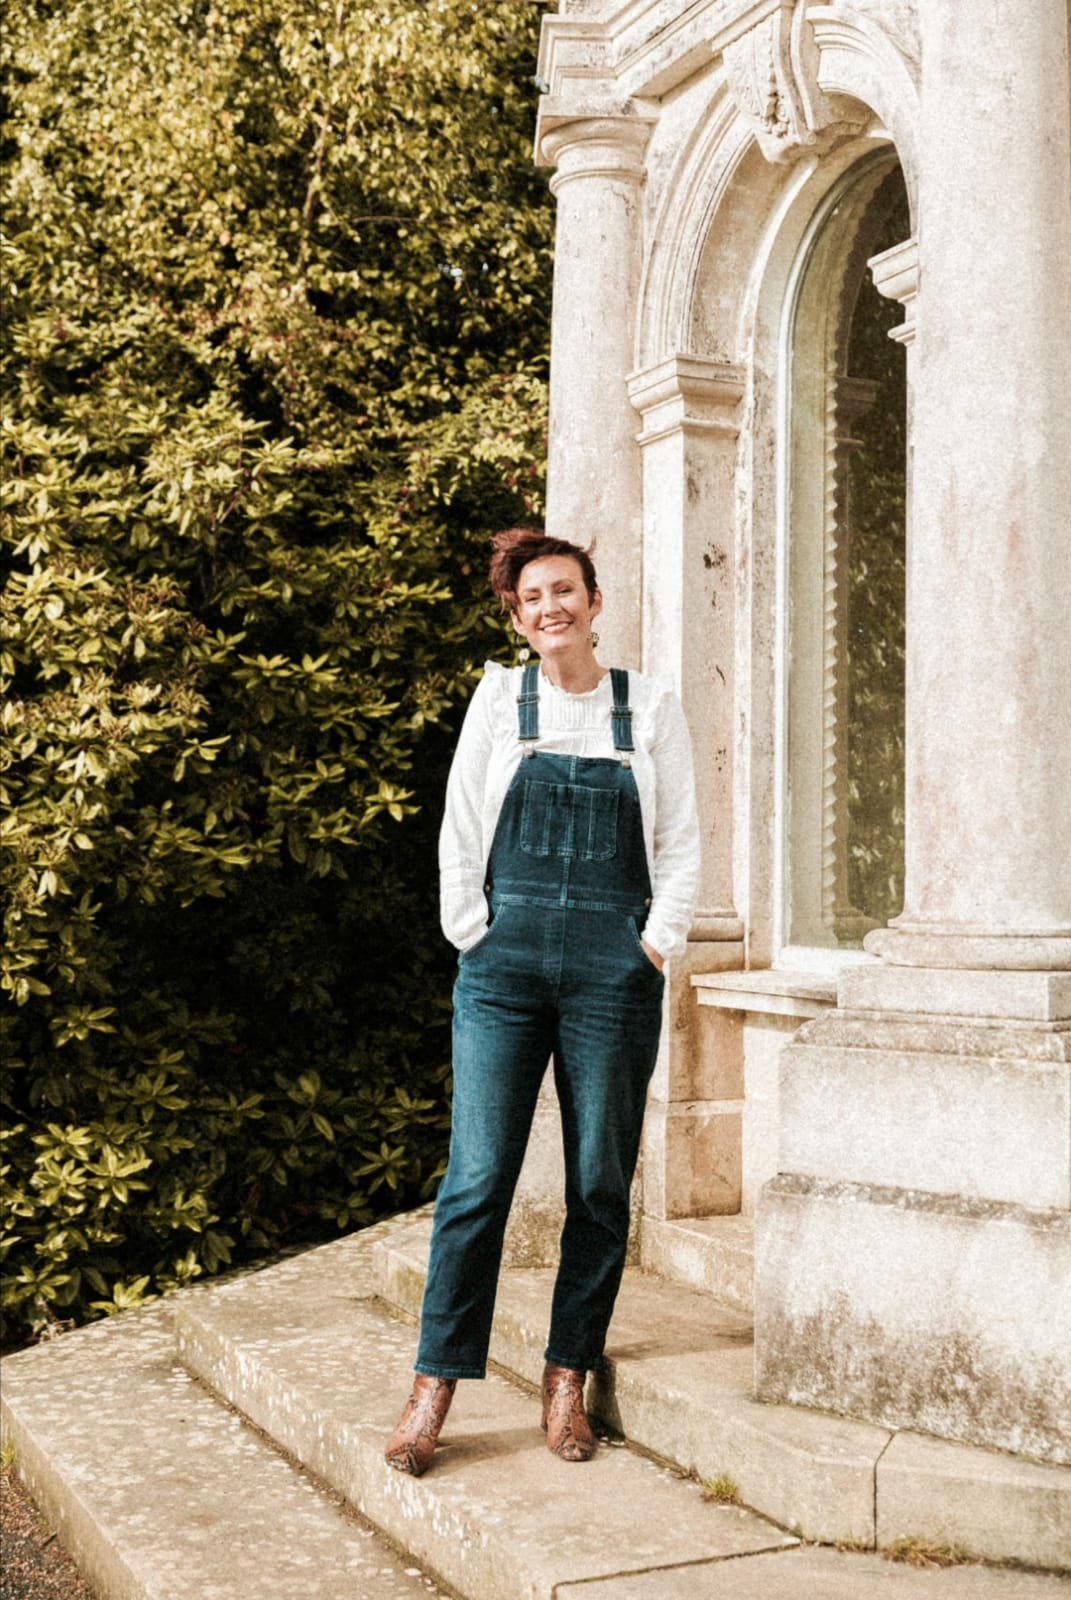 Susie Hasler: Stylist & Managing Director